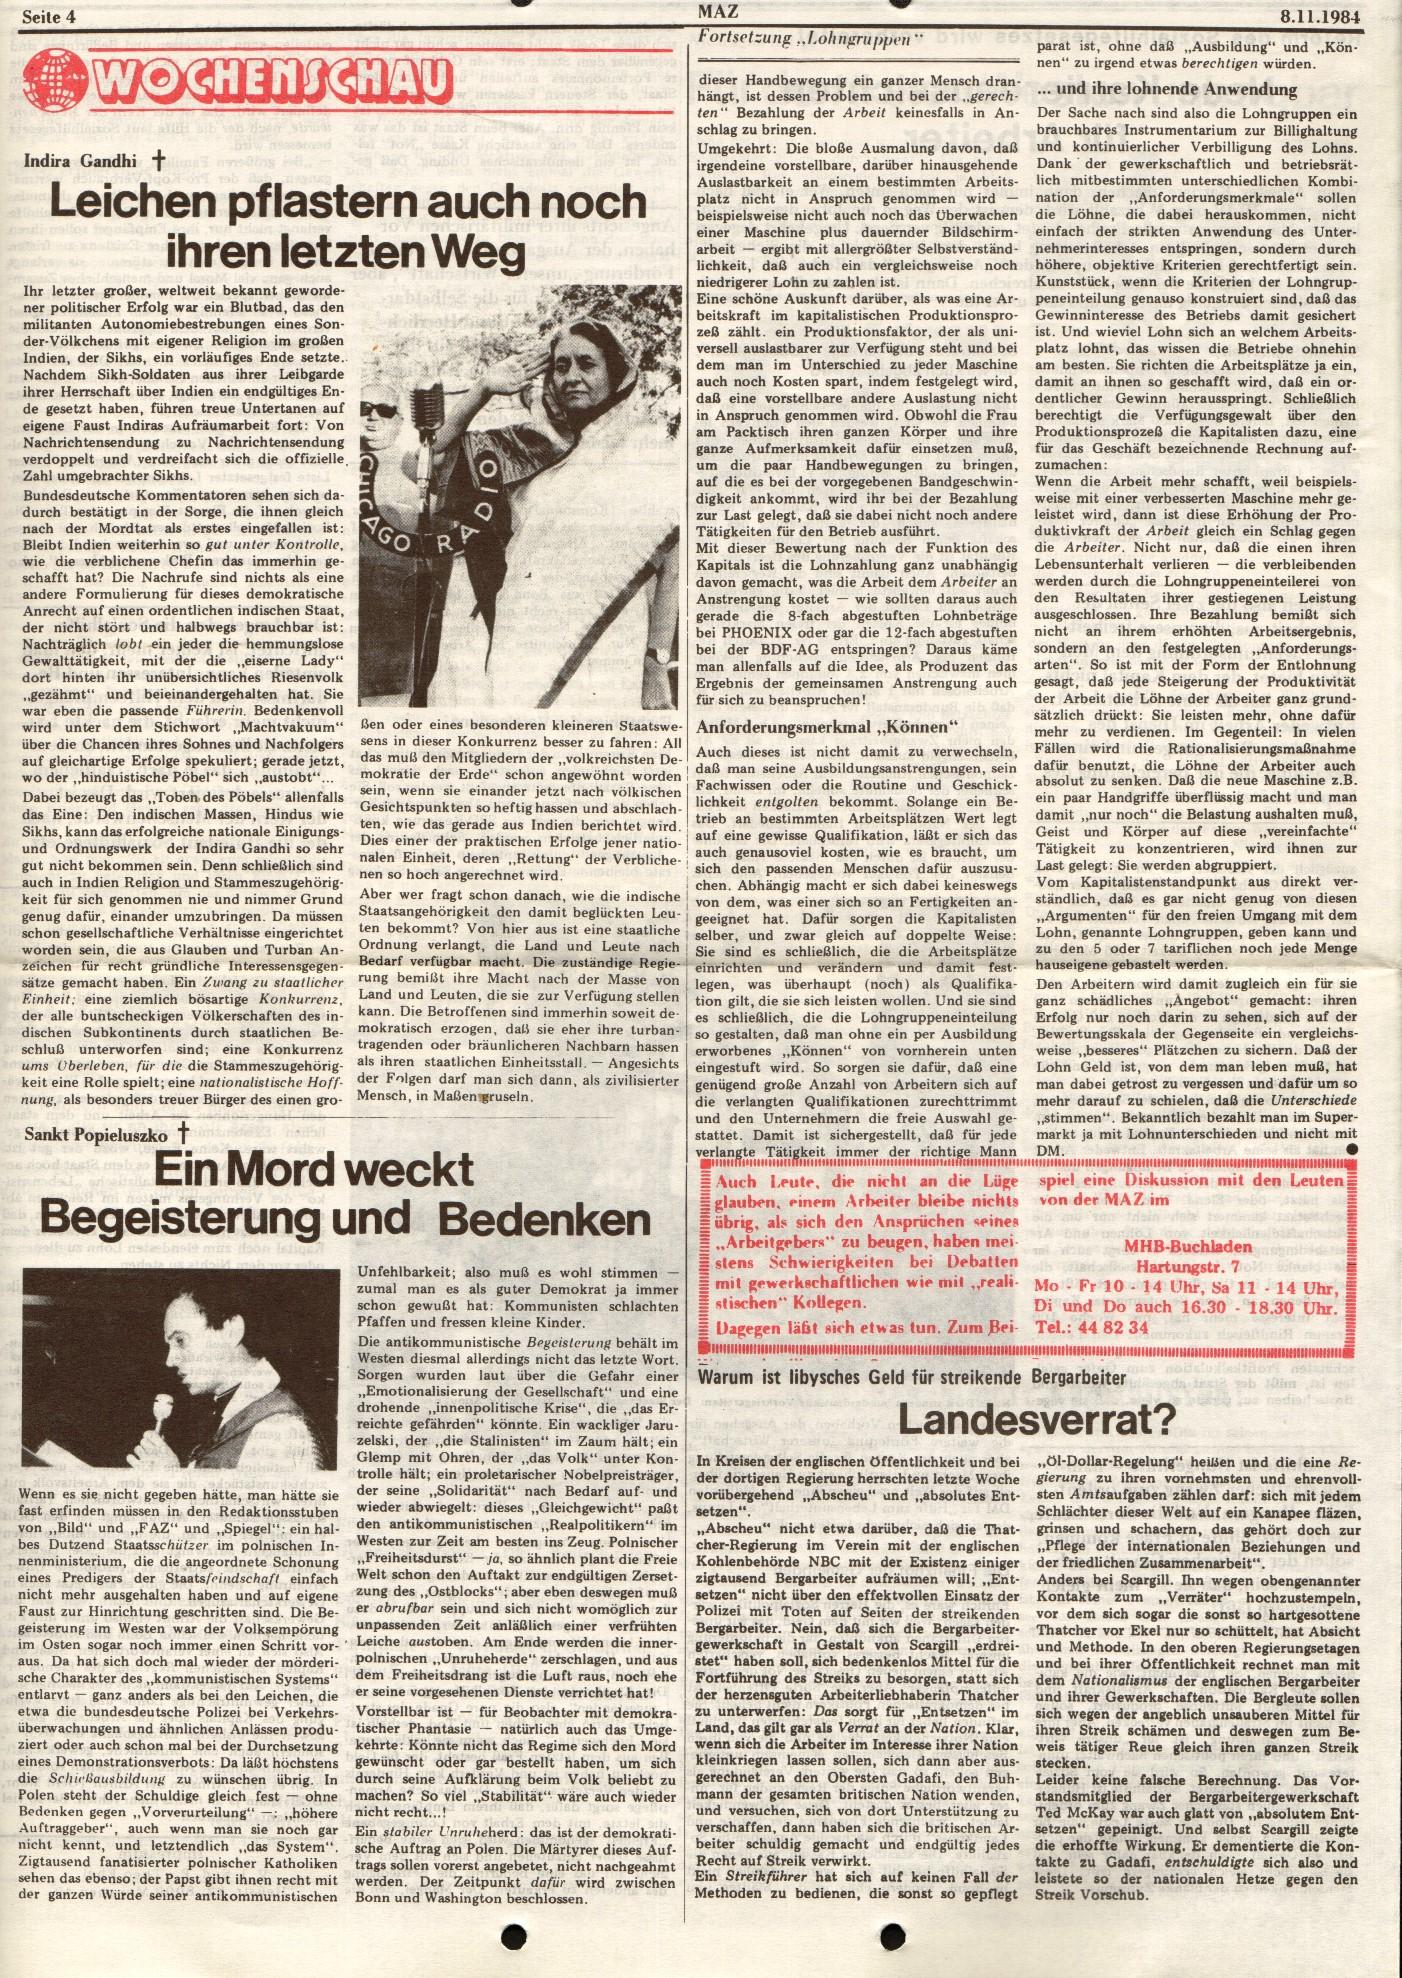 Hamburg_MG_MAZ_Chemie_19841108_04